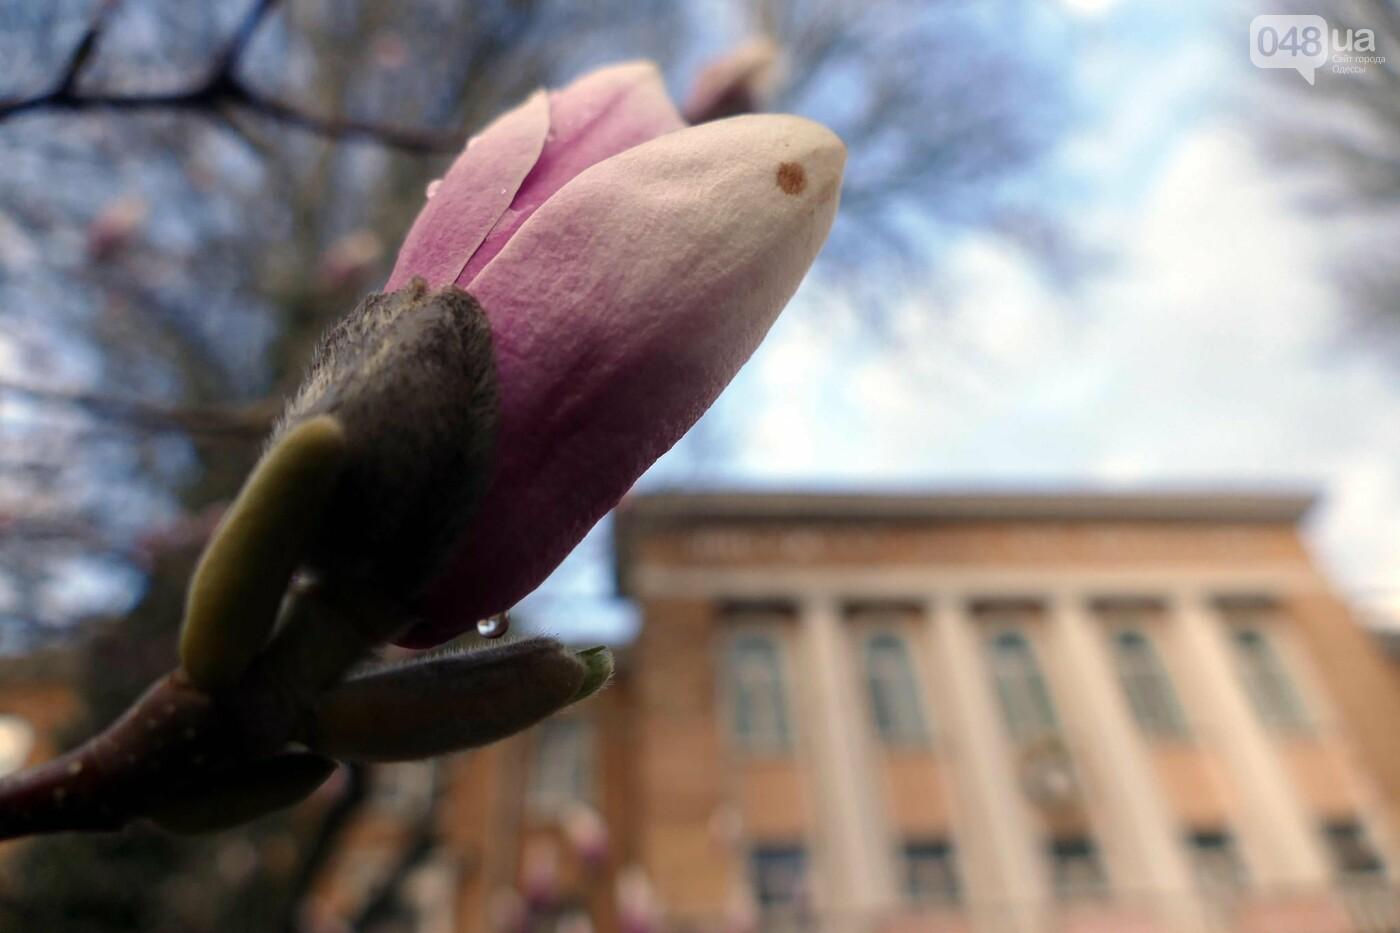 В Одессе начали цвести магнолии,- ФОТО, фото-12